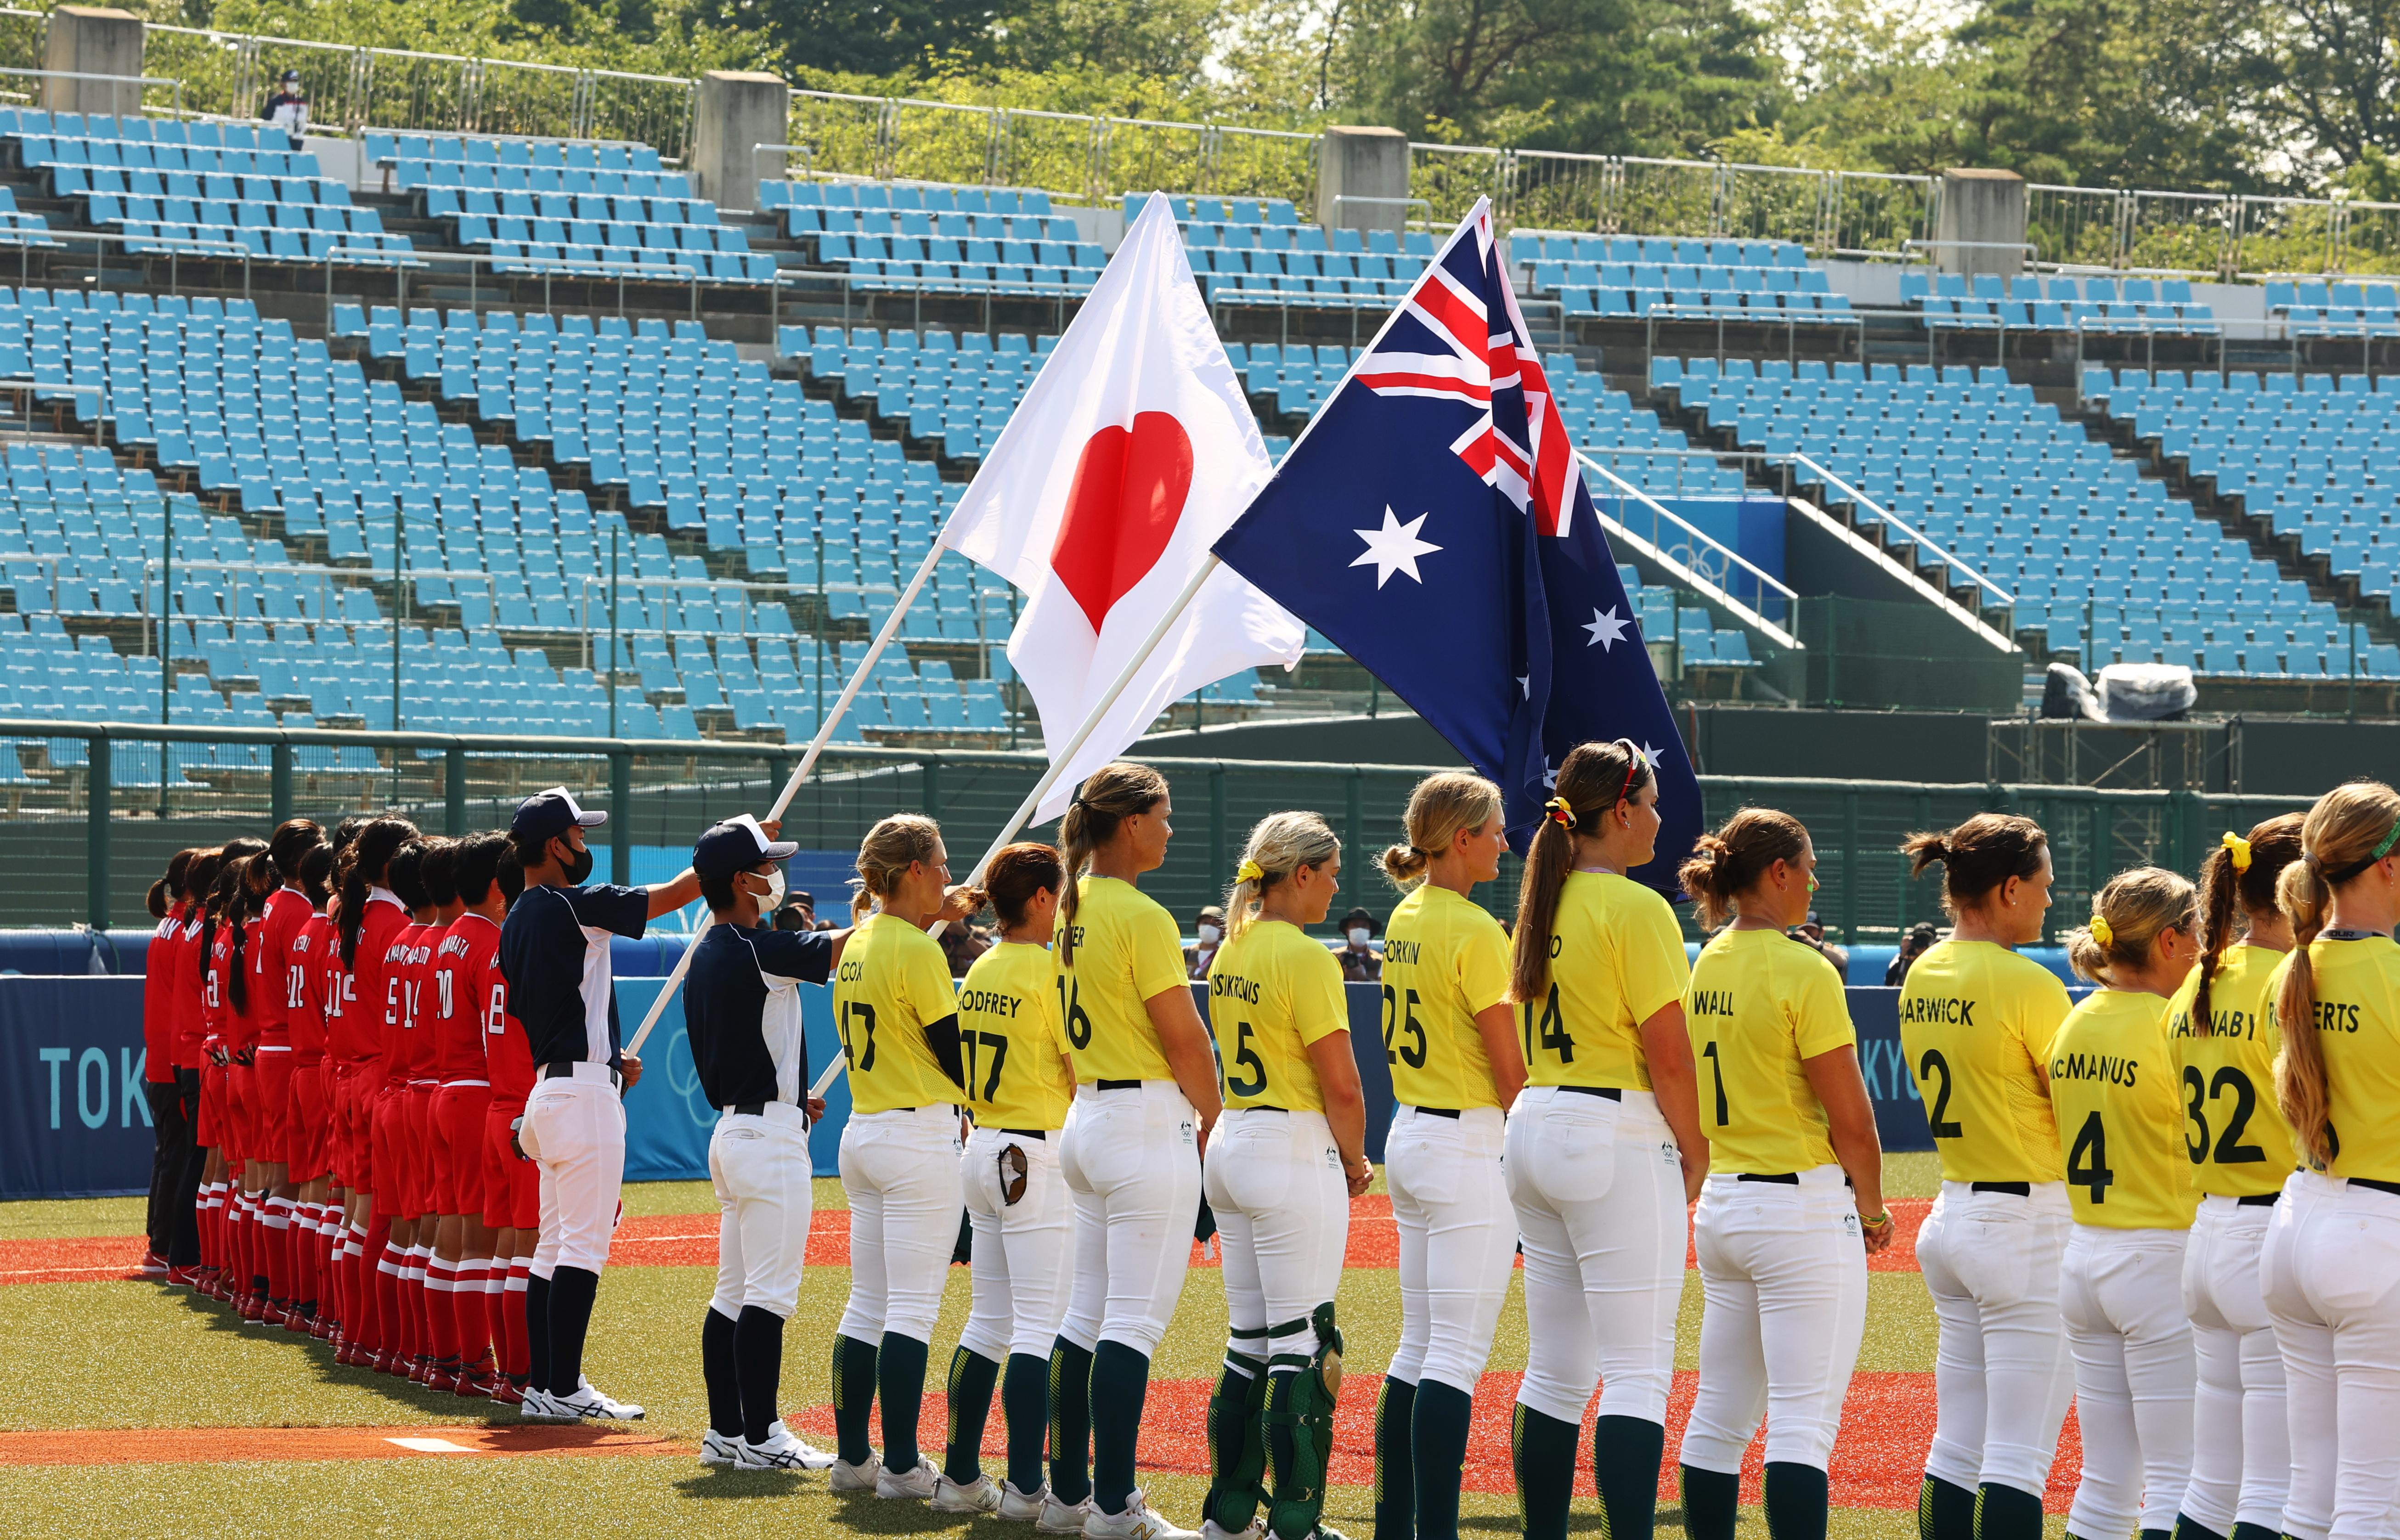 Tokyo 2020 Olympics - Softball - Women - Opening Round - Australia v Japan - Fukushima Azuma Baseball Stadium - Fukushima, Japan - July 21, 2021. Players during national anthems. REUTERS/Jorge Silva